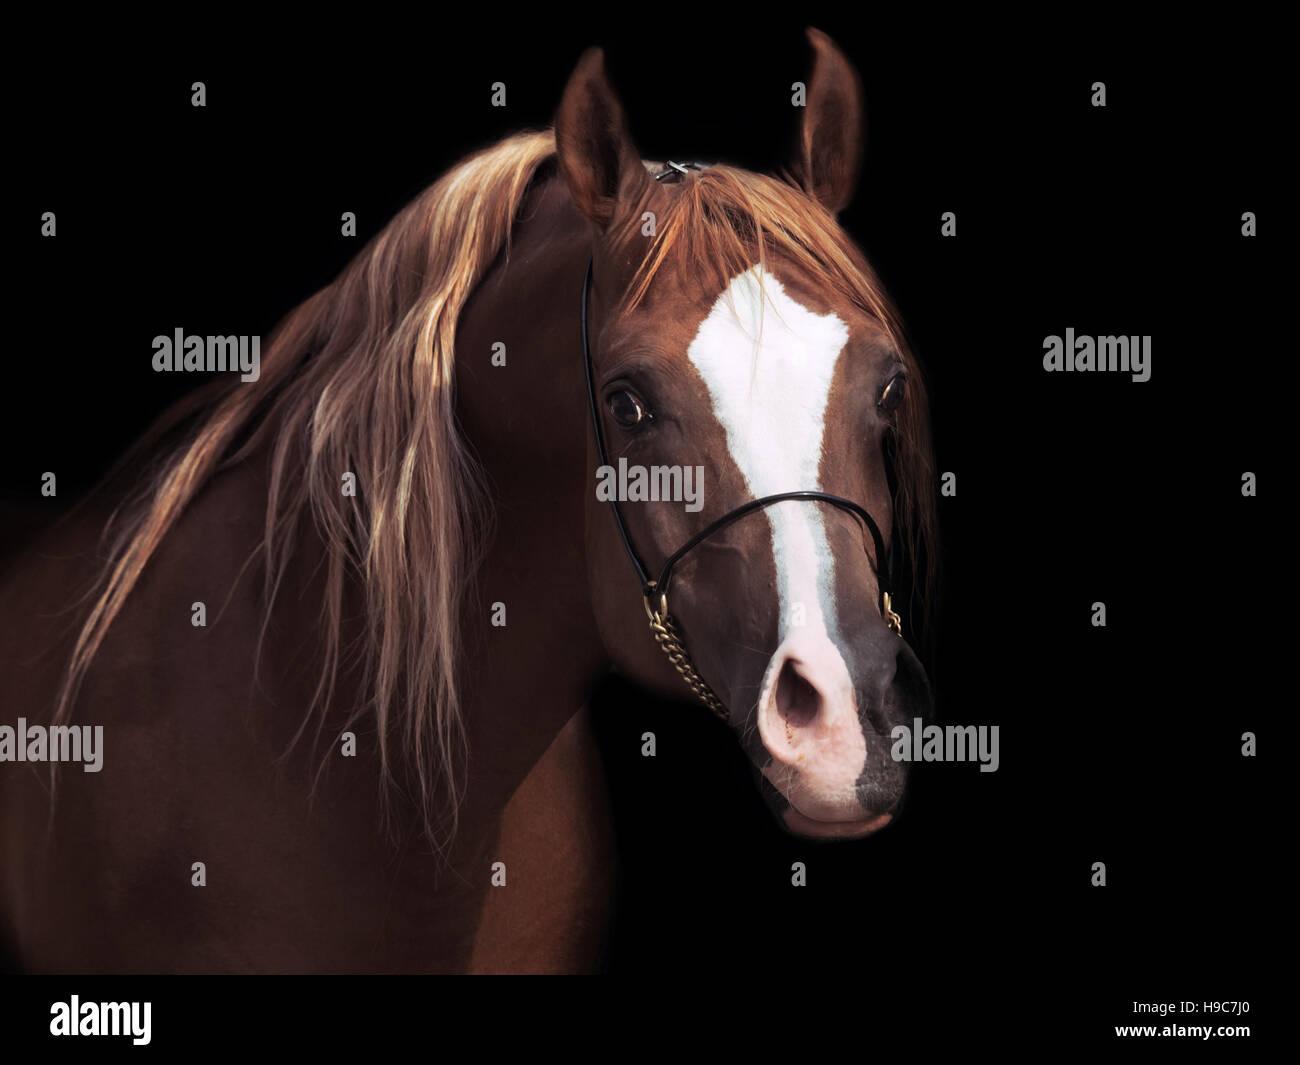 portrait od adult arabian stallion at black background - Stock Image